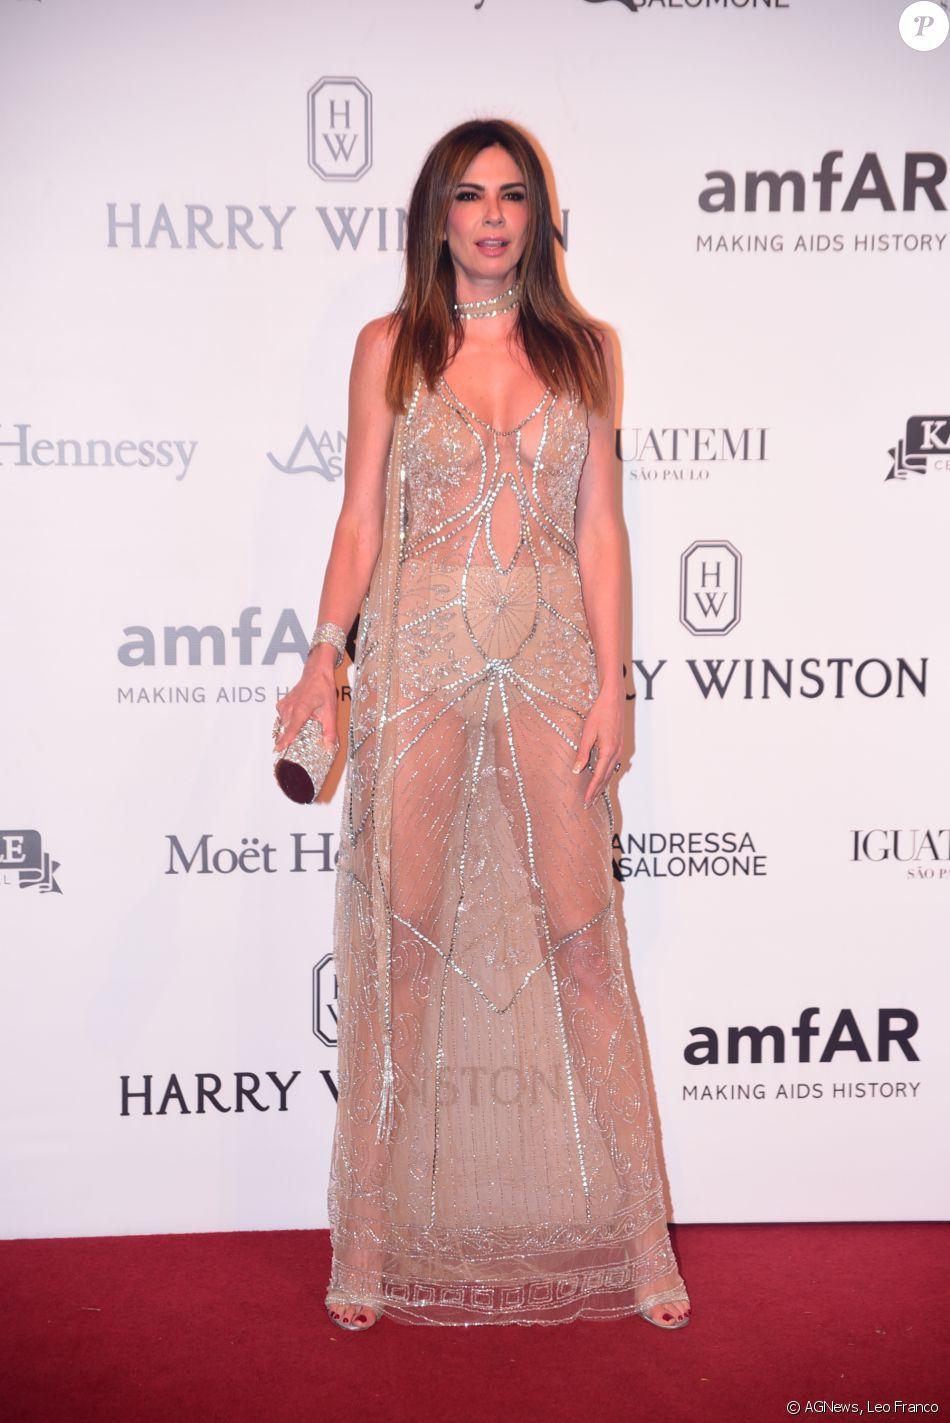 Luciana Gimenez Foi Ao Baile Da AmfAR Com Vestido Longo